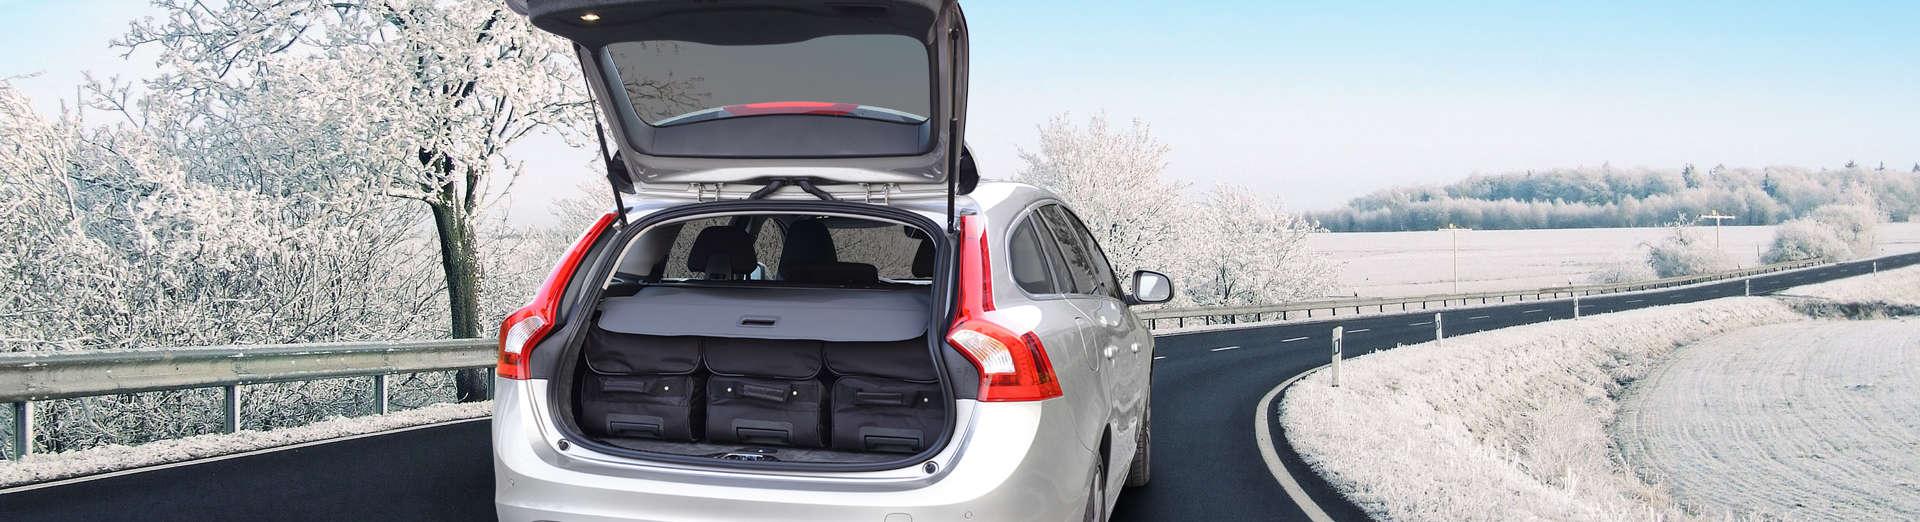 car-bags-concept-3